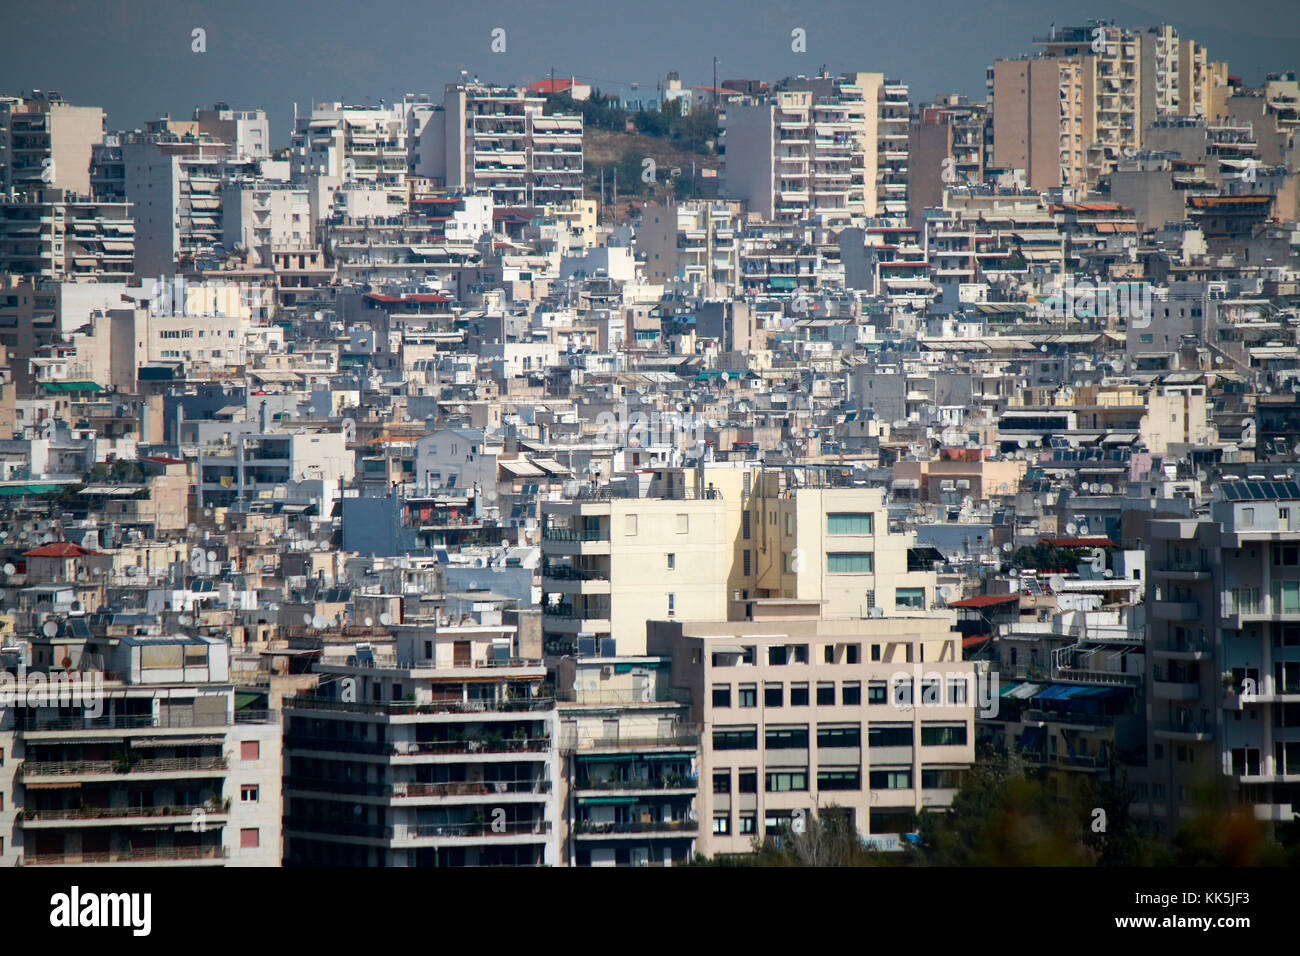 Skyline, Athen, Griechenland. Stock Photo